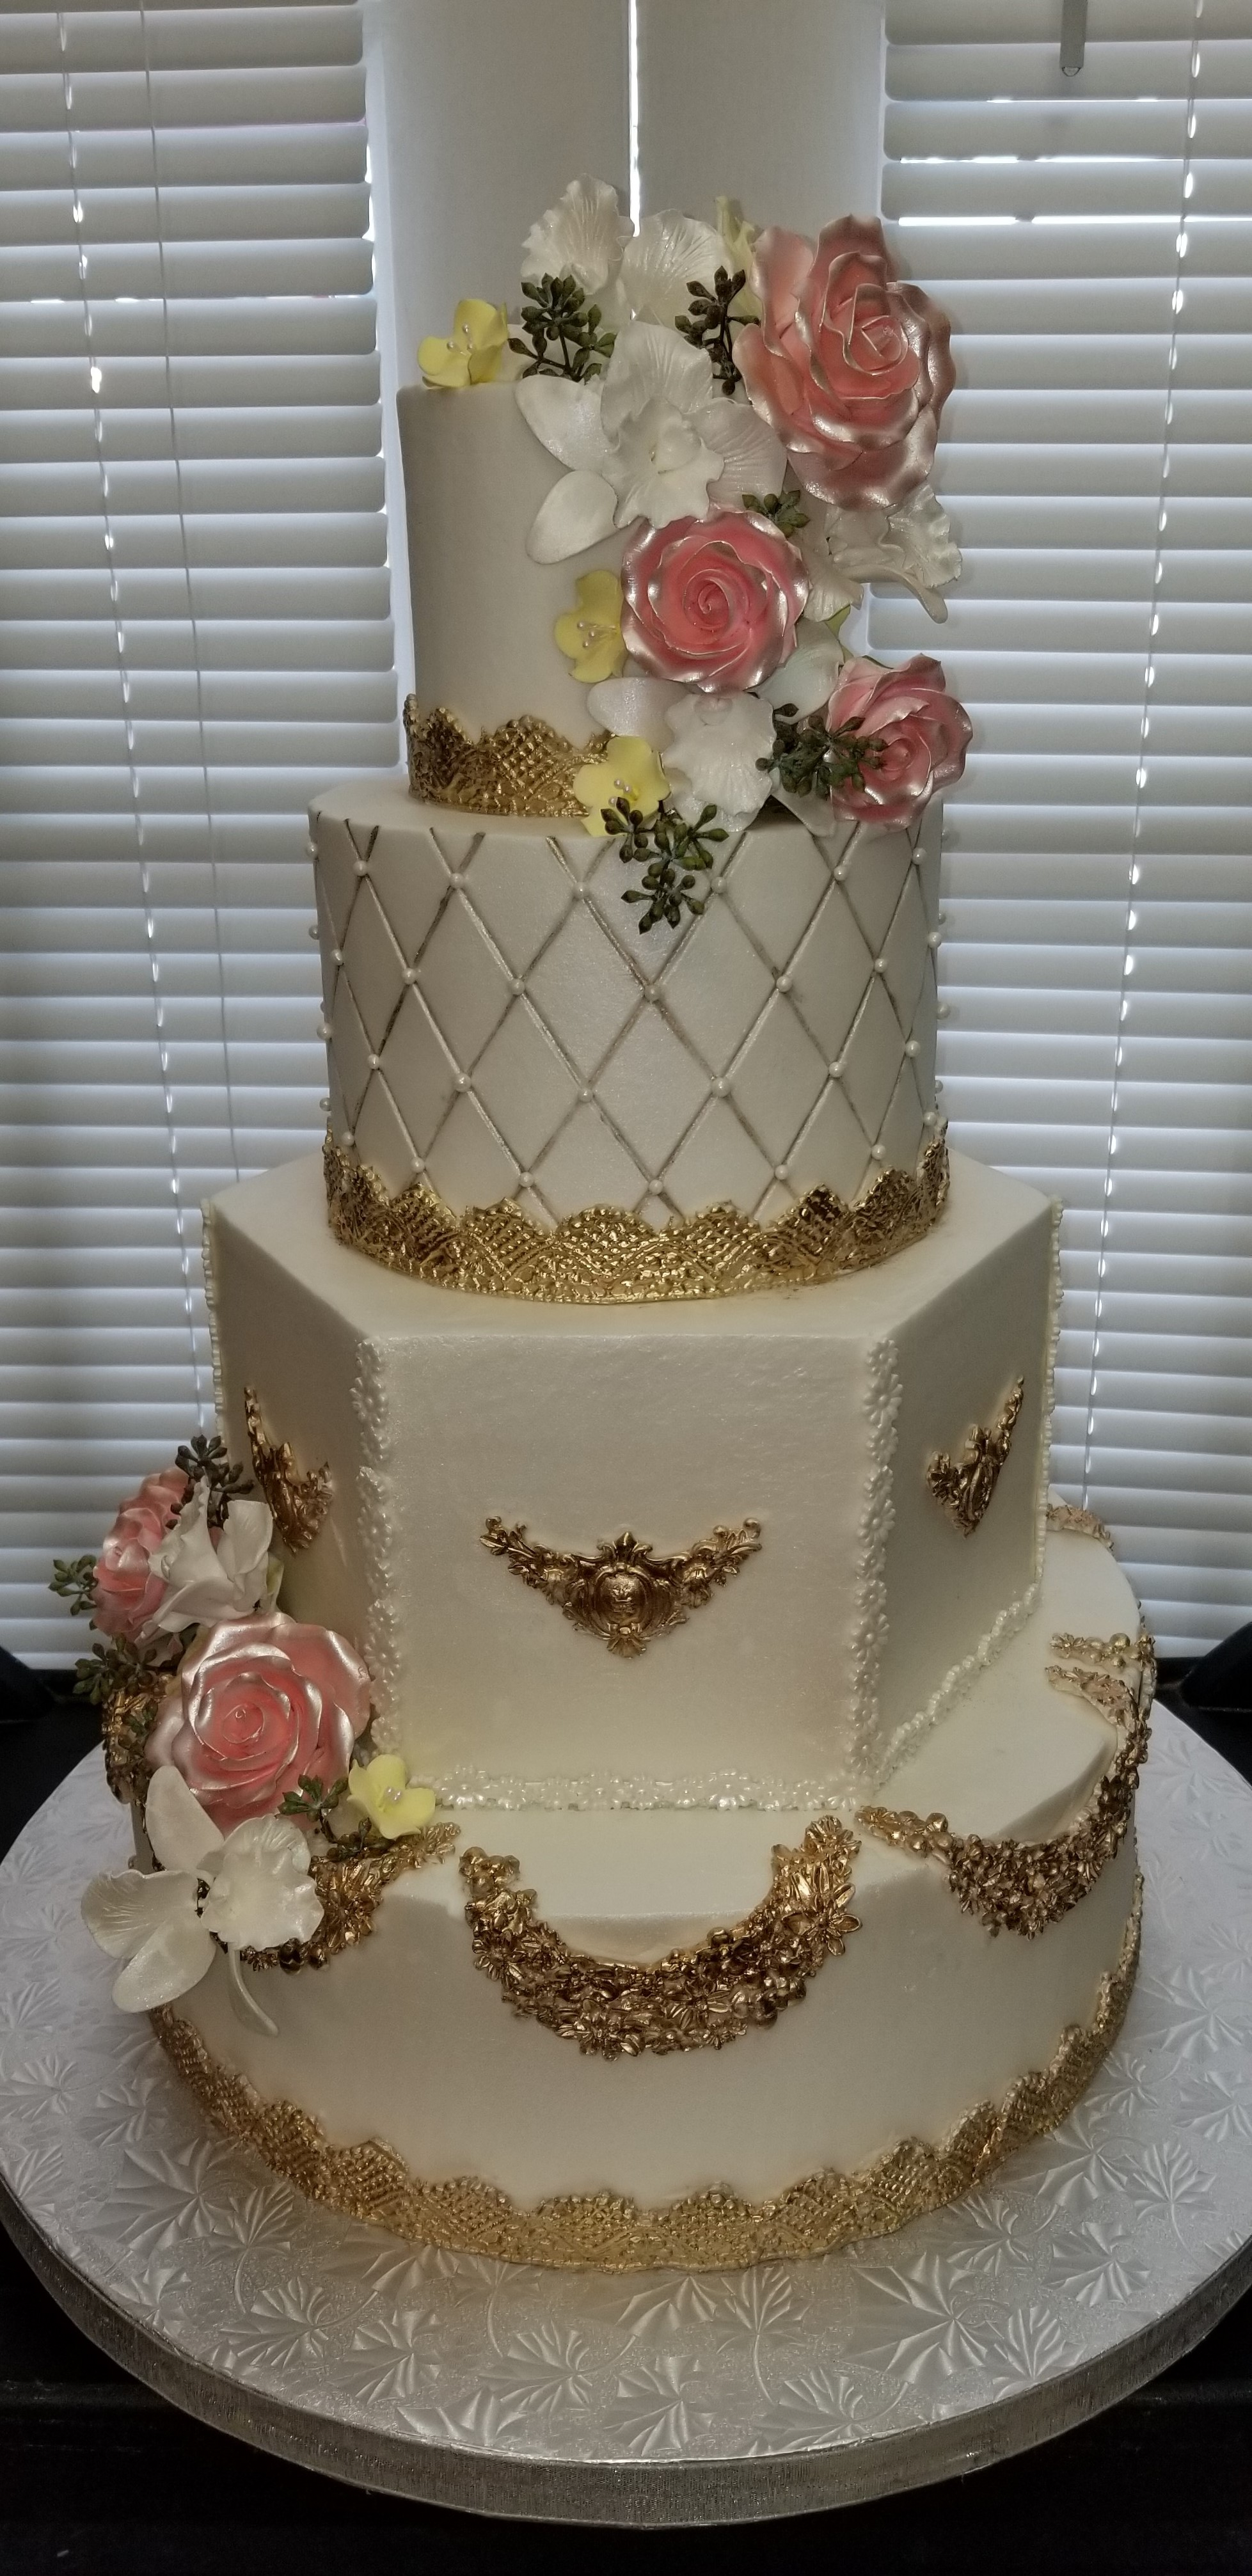 Wedding Cakes by Tammy Allen image 19